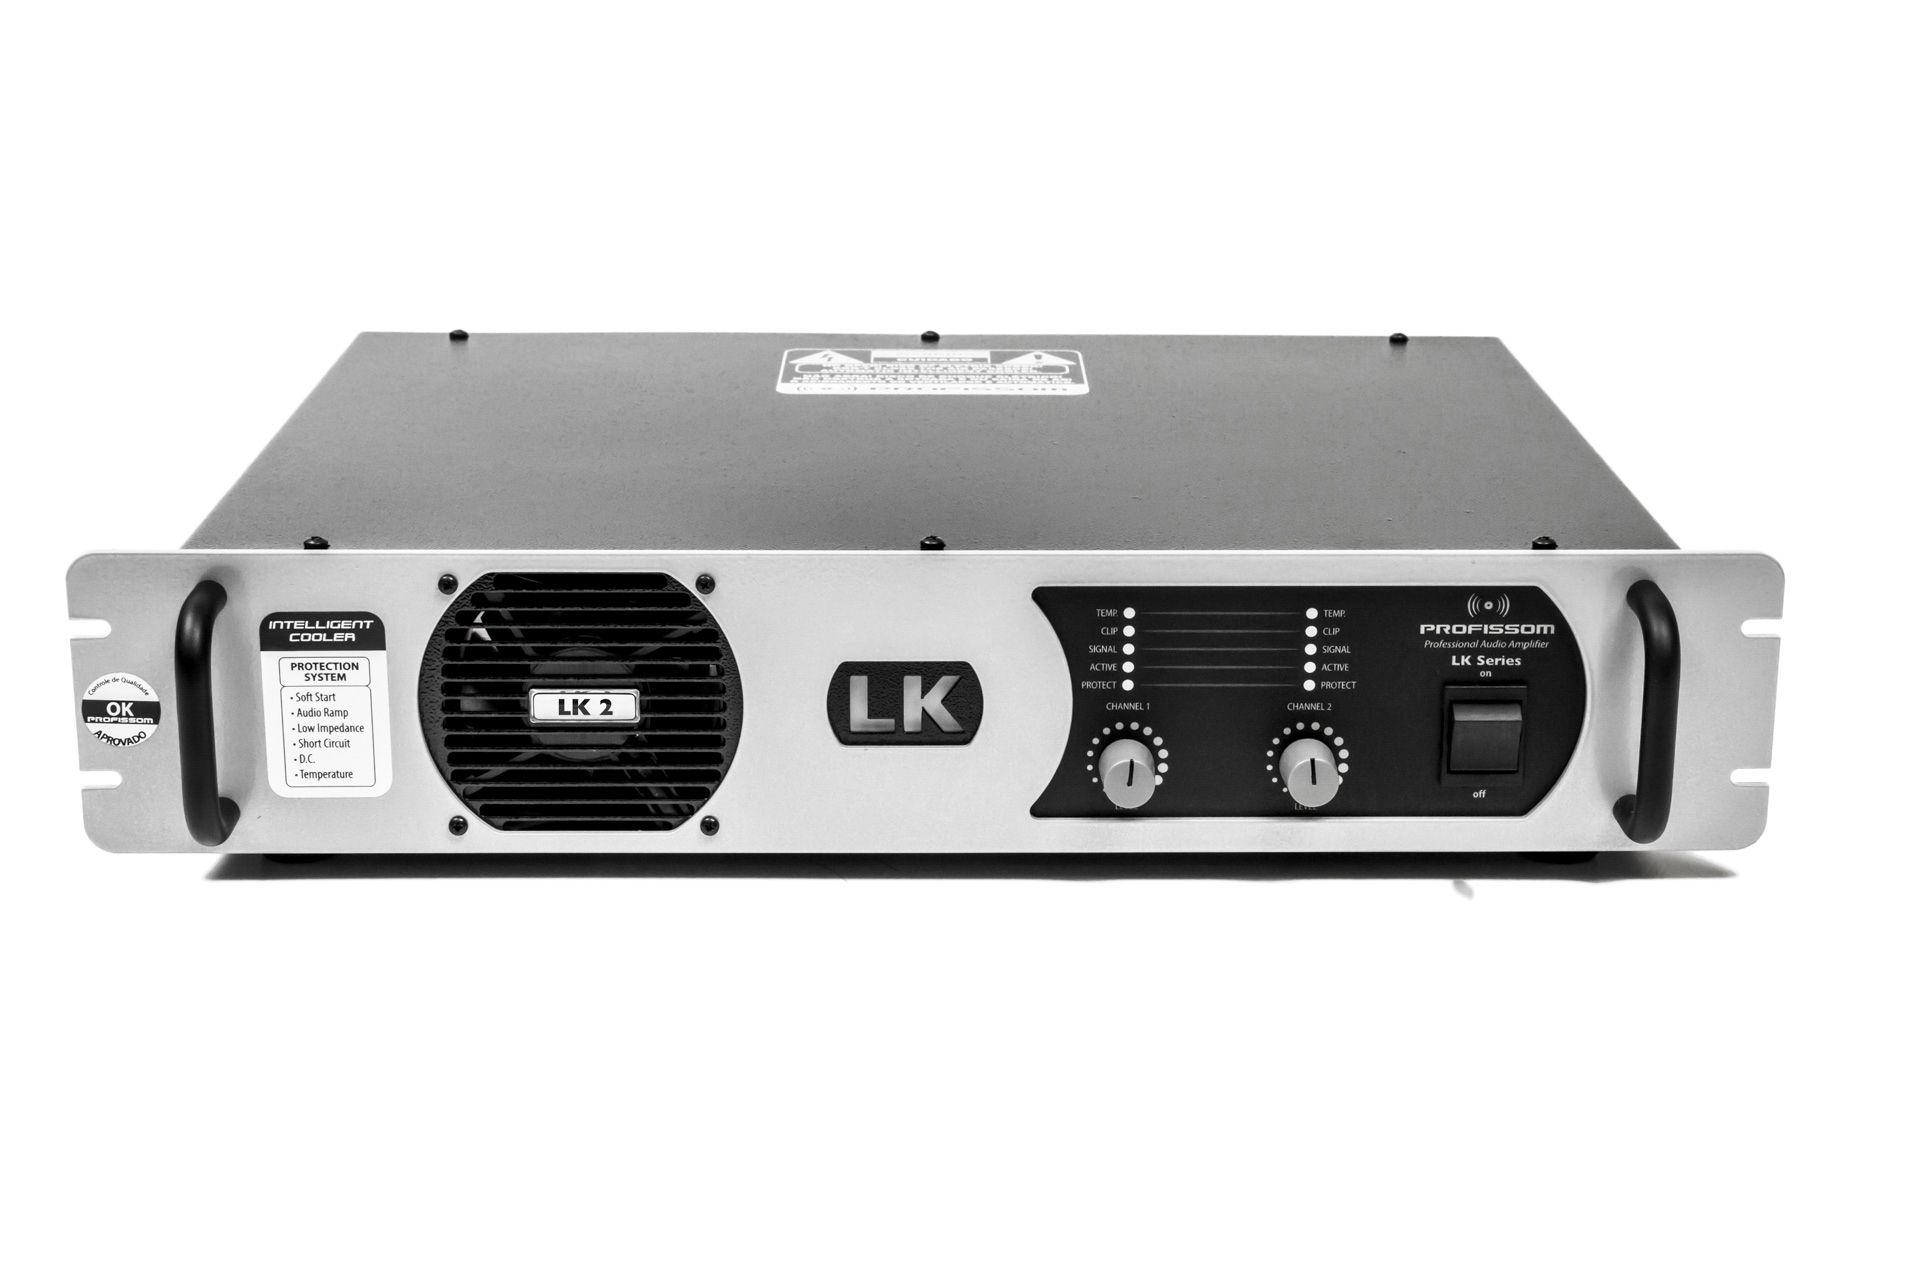 Amplificador Profissom LK 2 (500 W rms · 4 ohms)